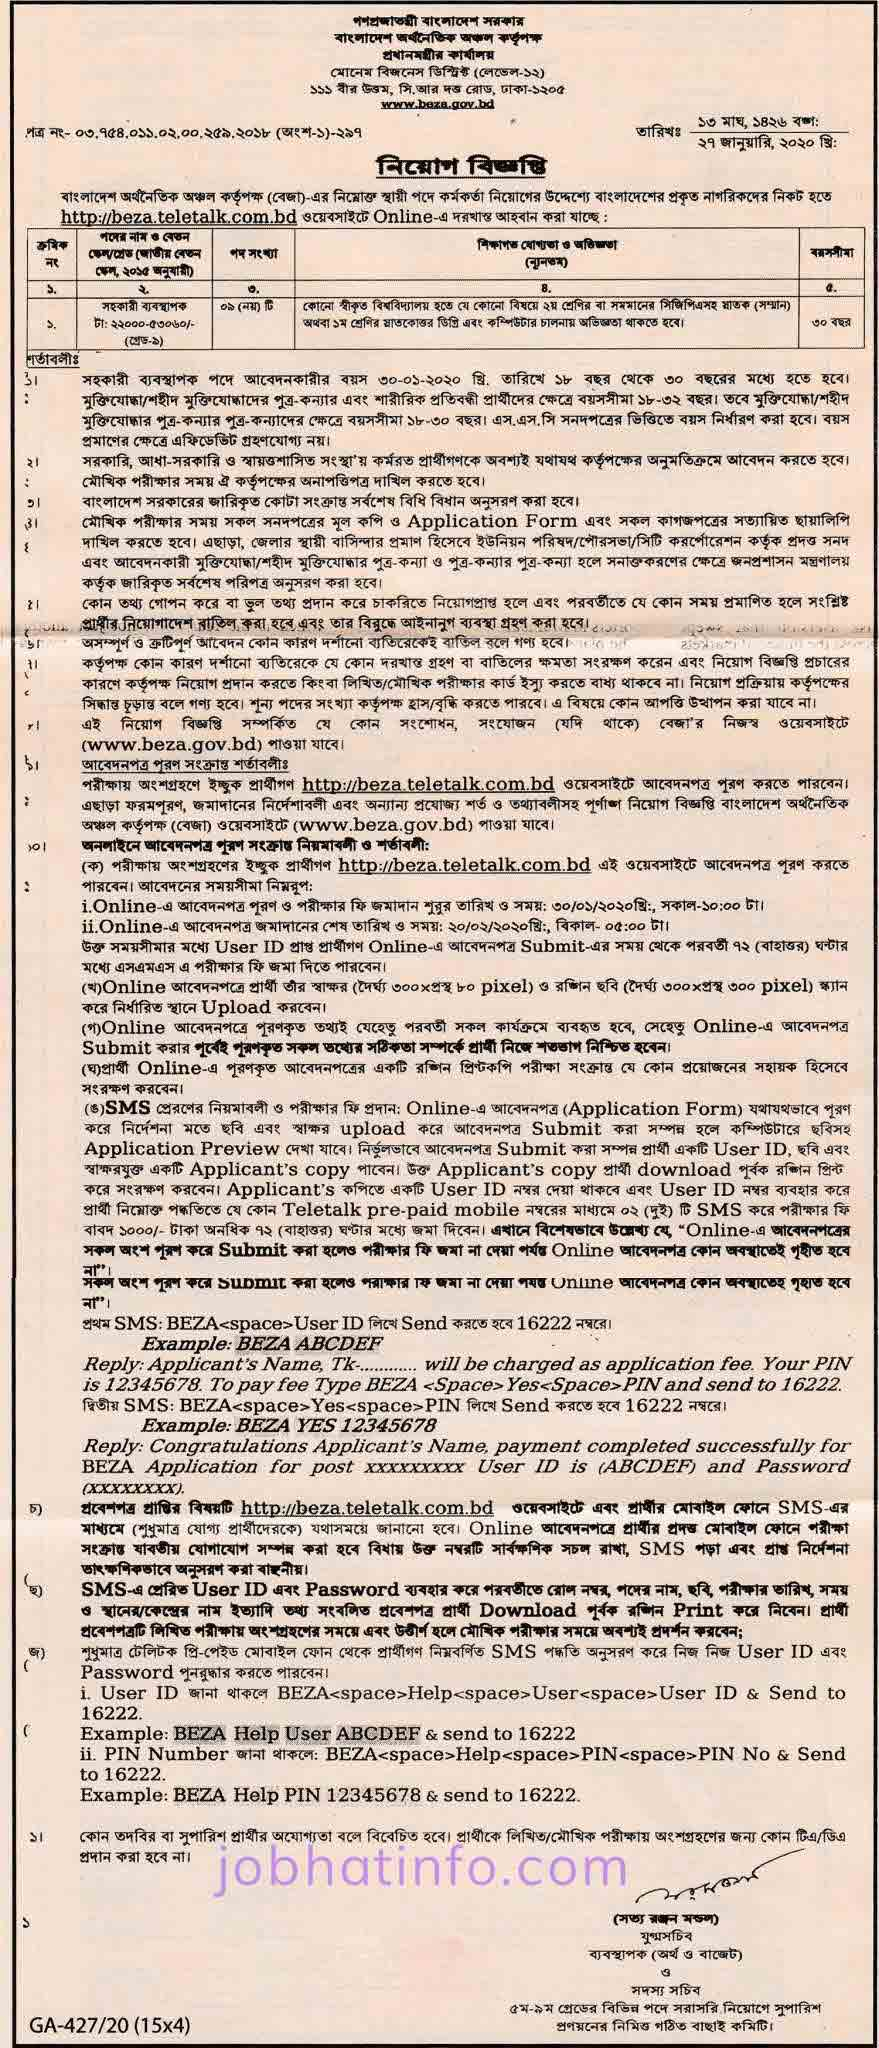 Bangladesh Economic Zone Authority (BEZA) Circular 2